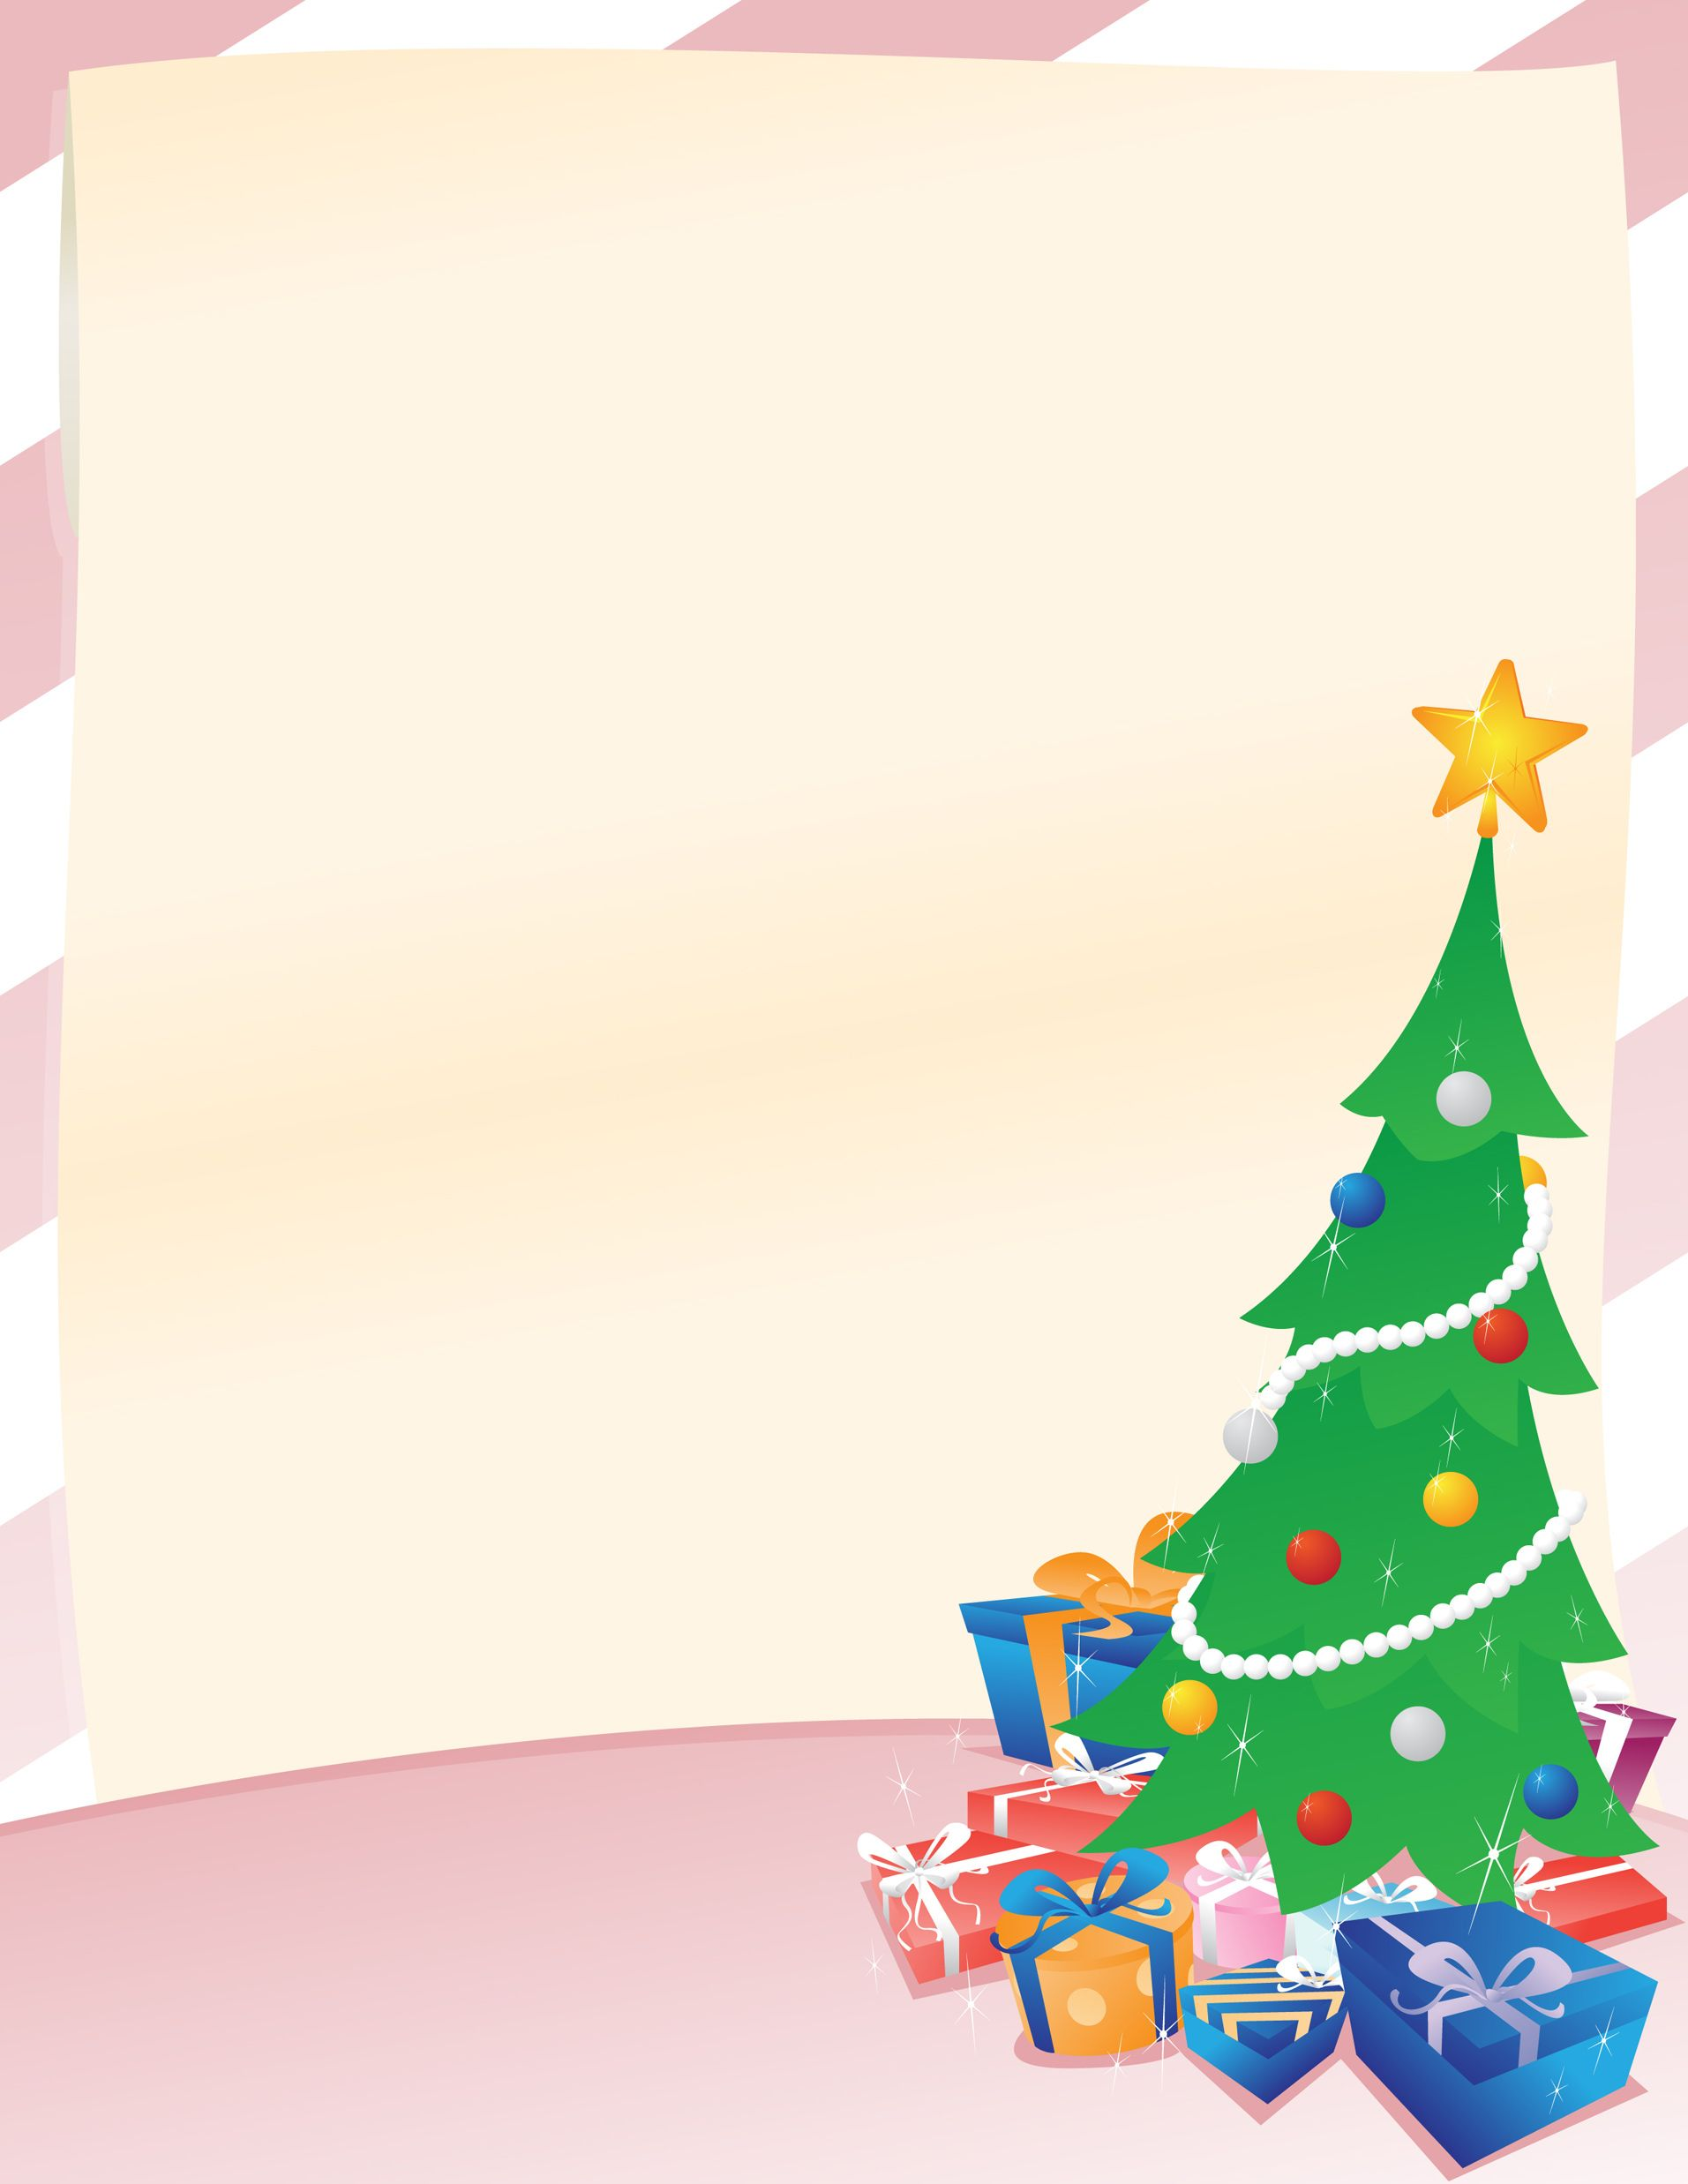 Free Christmas Flyer Designs White, Blue, Orange, Red